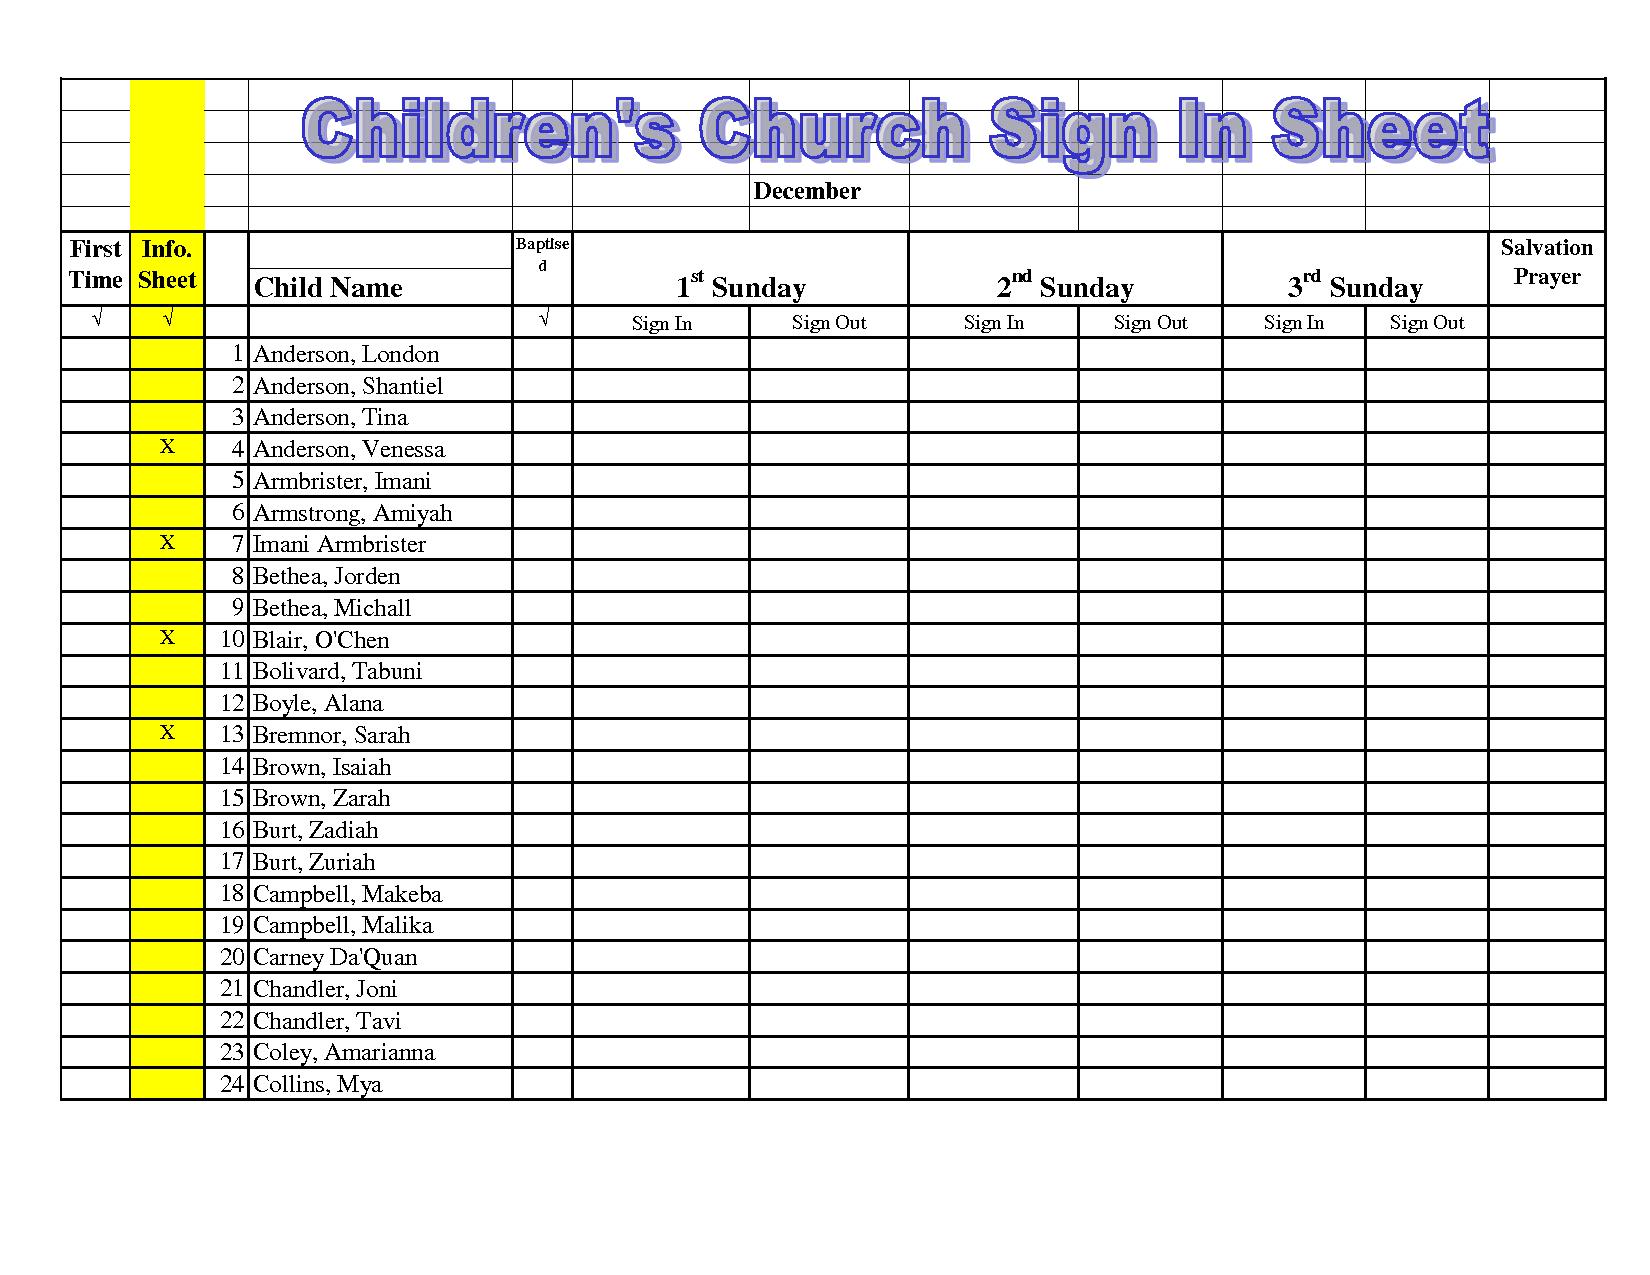 Children's Church Sign In Sheet Template  Google Search regarding Printable Children's Church Sign In Sheet Template